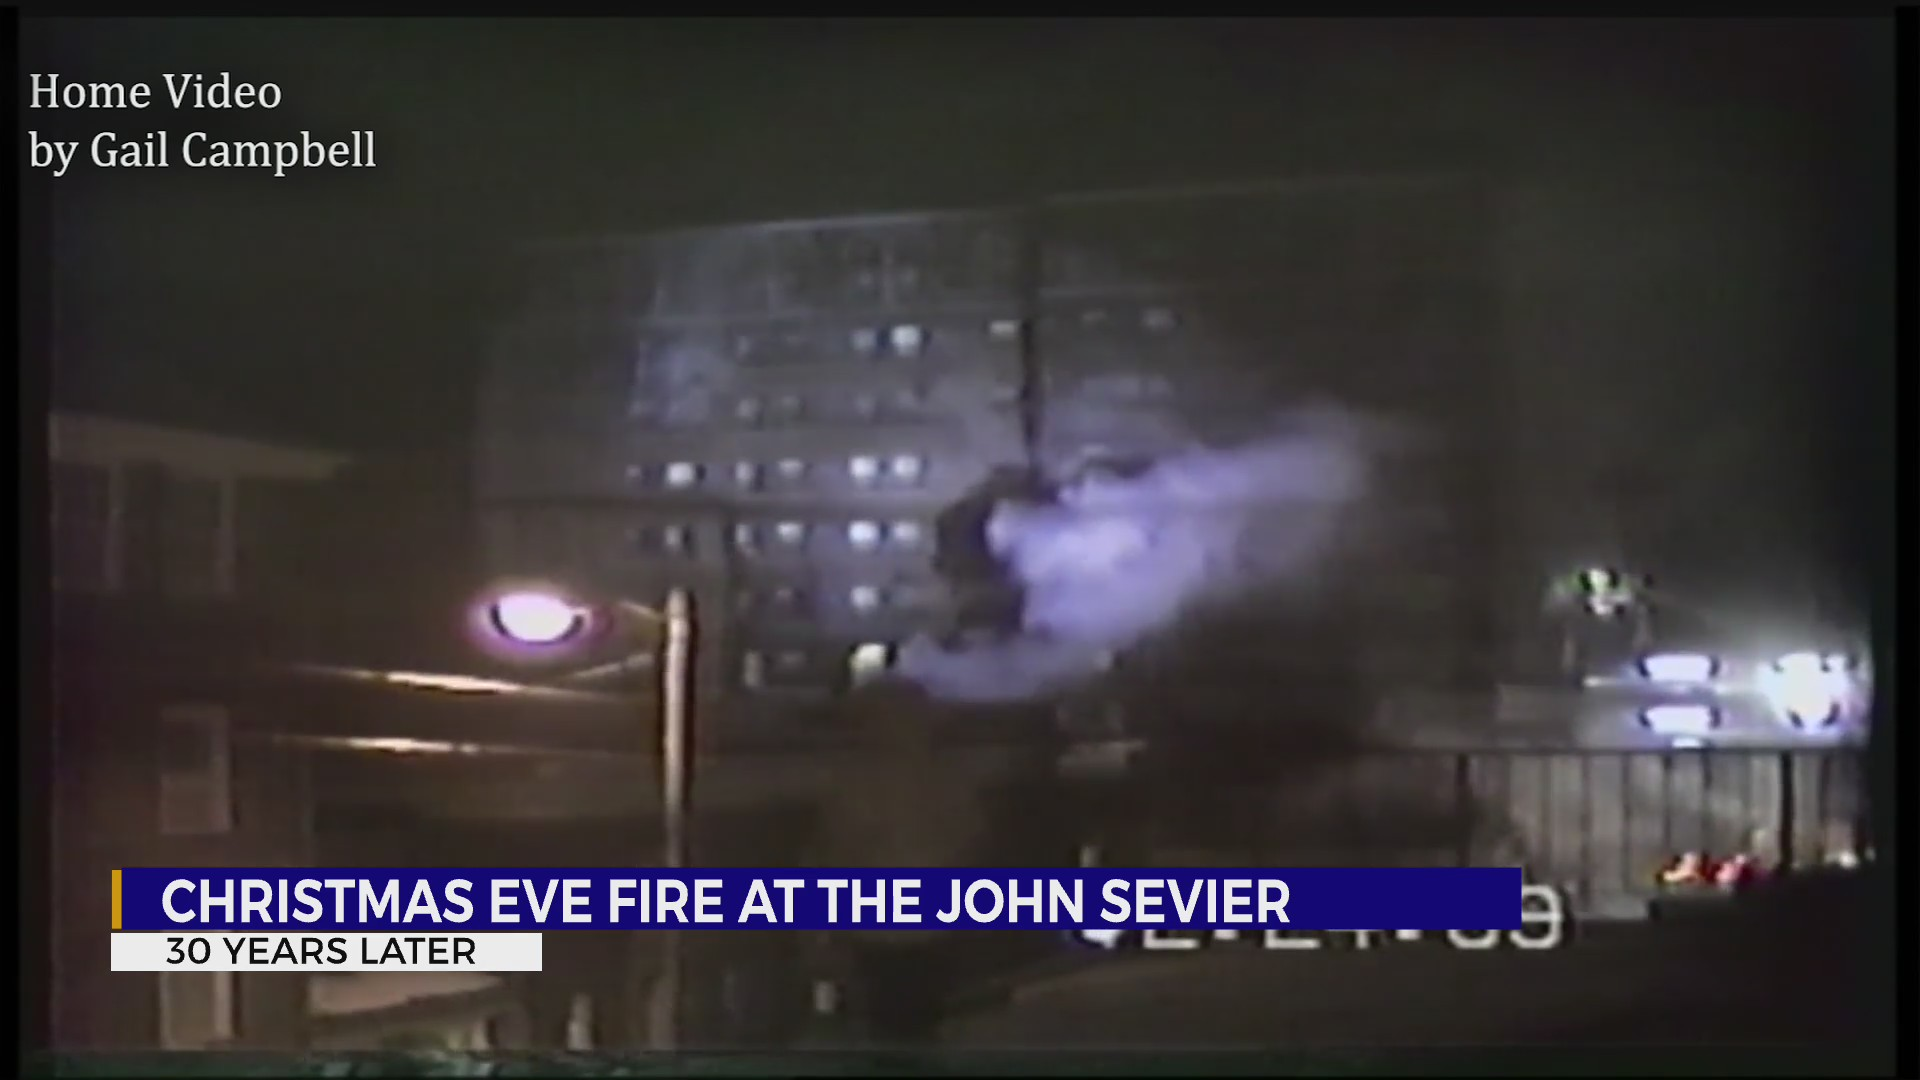 Rare home video of 1989 John Sevier fire reveals tragedy, heroism